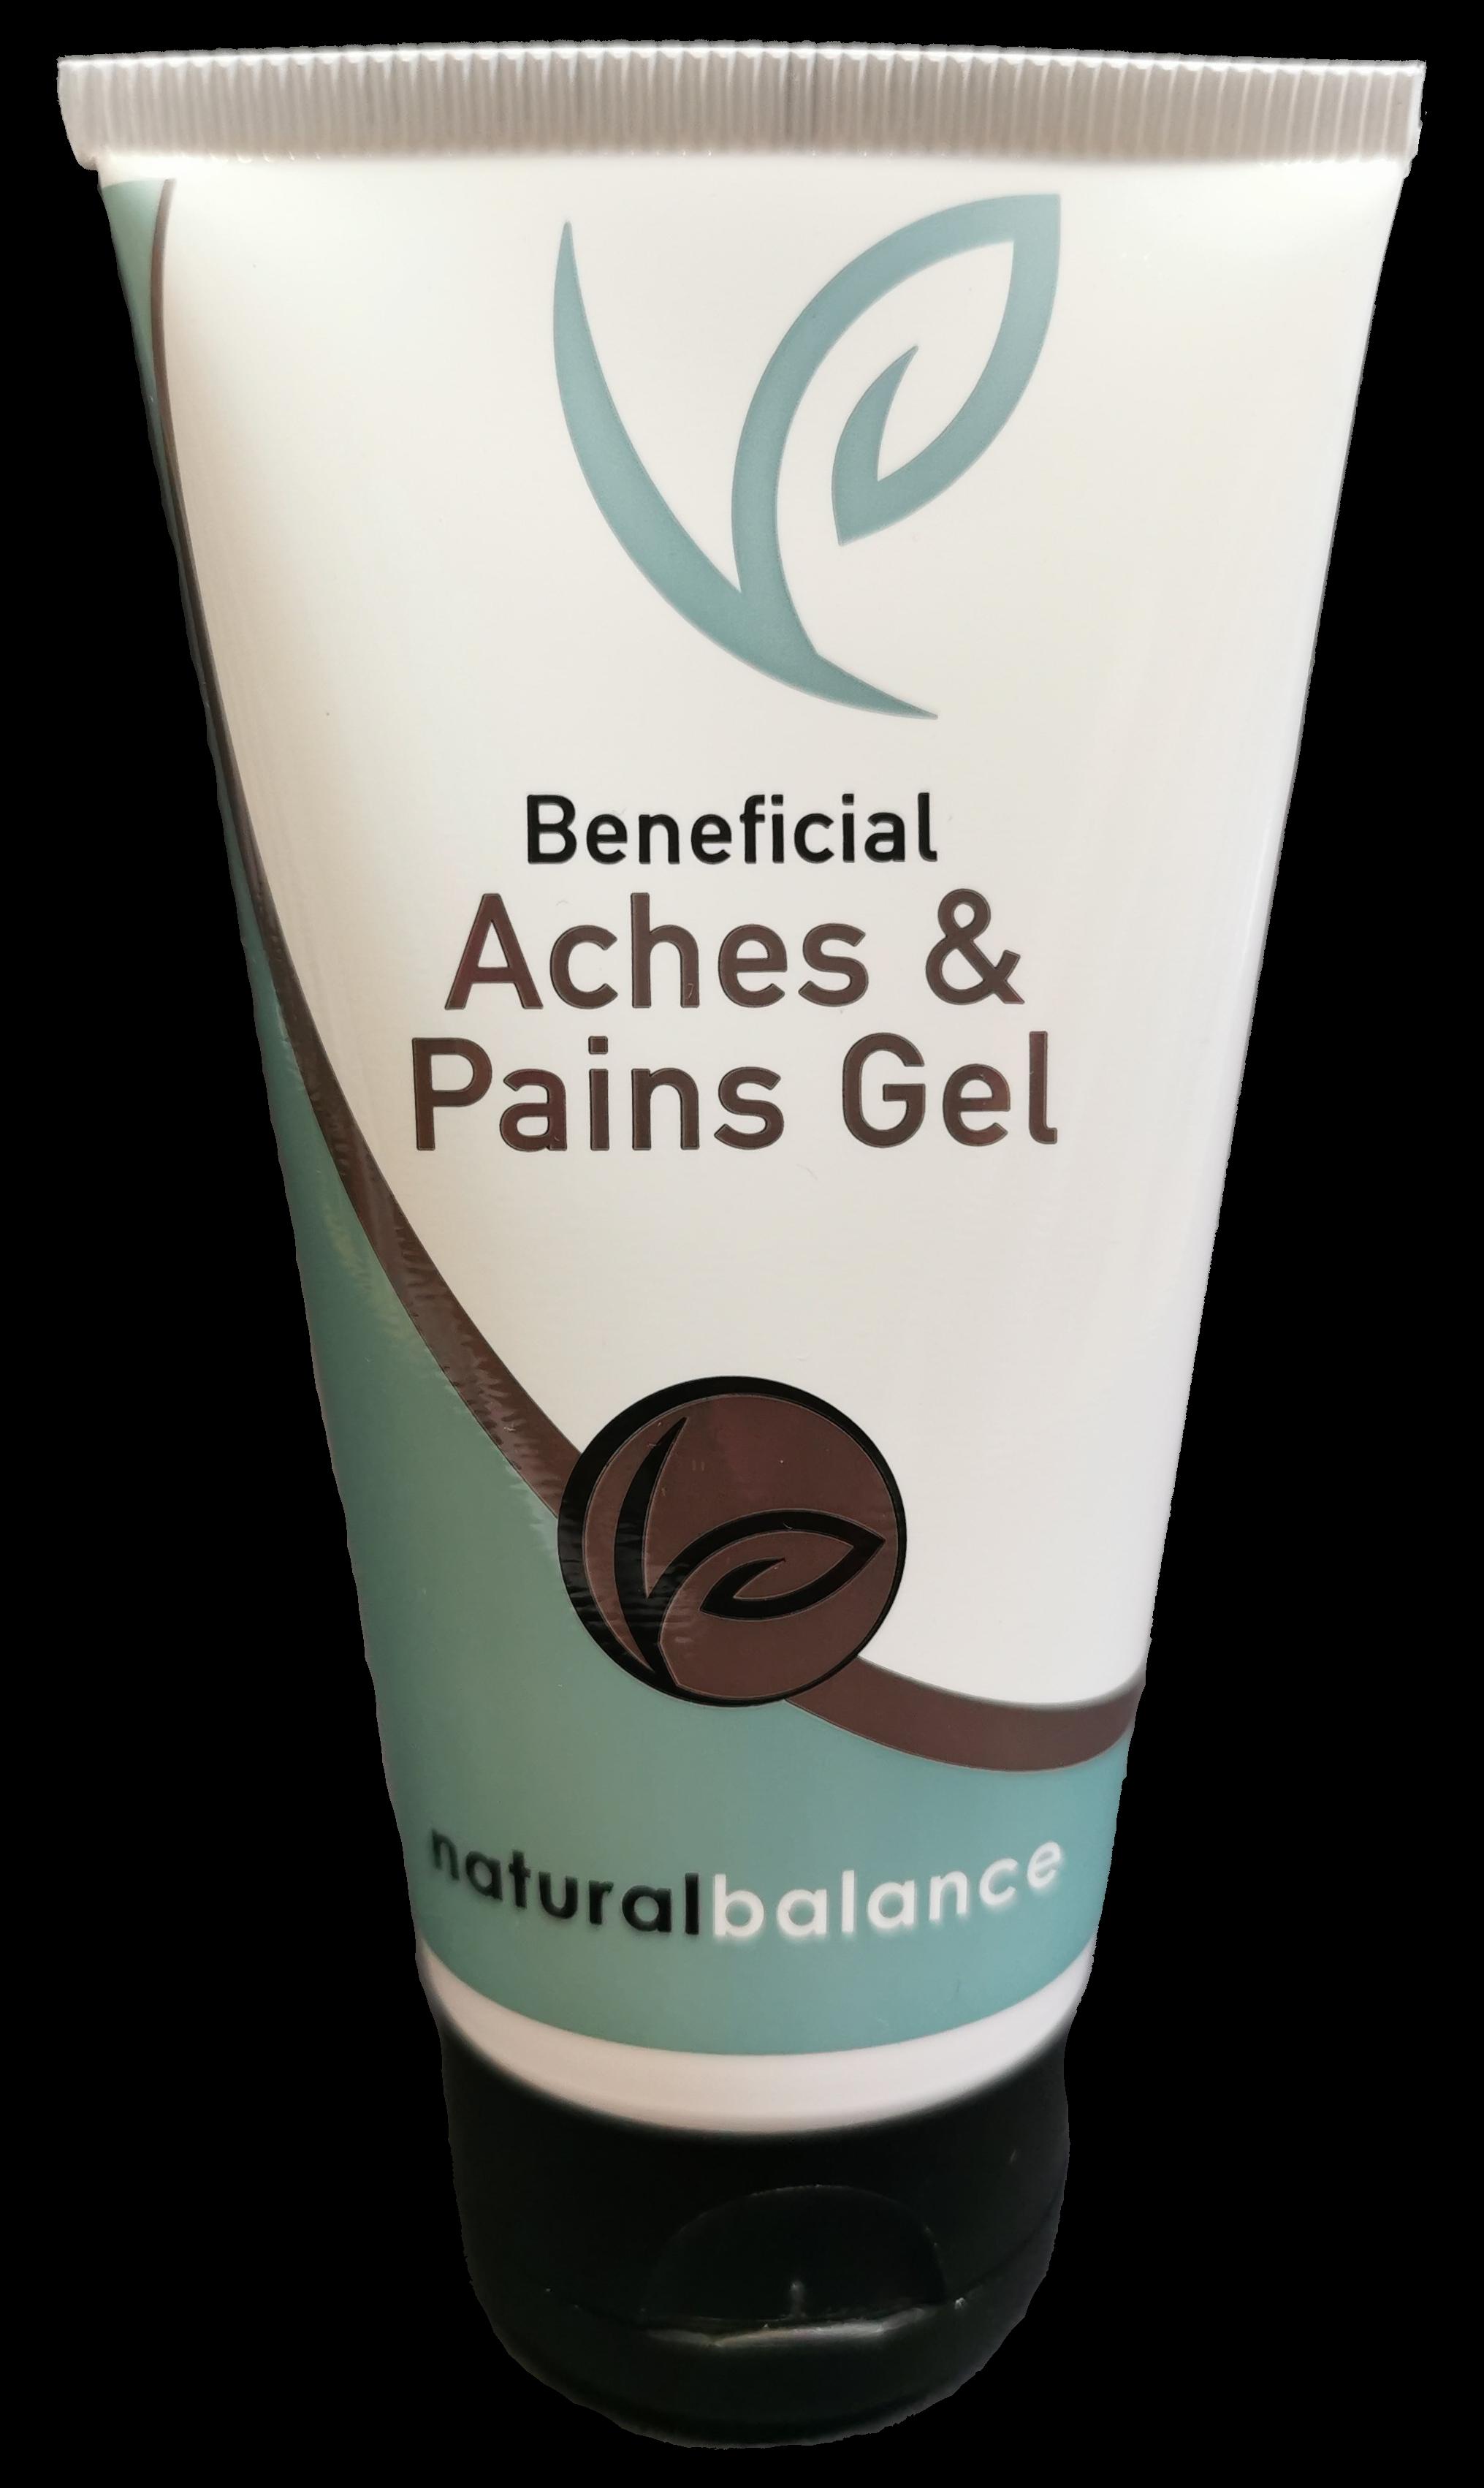 Aches & Pains Gel